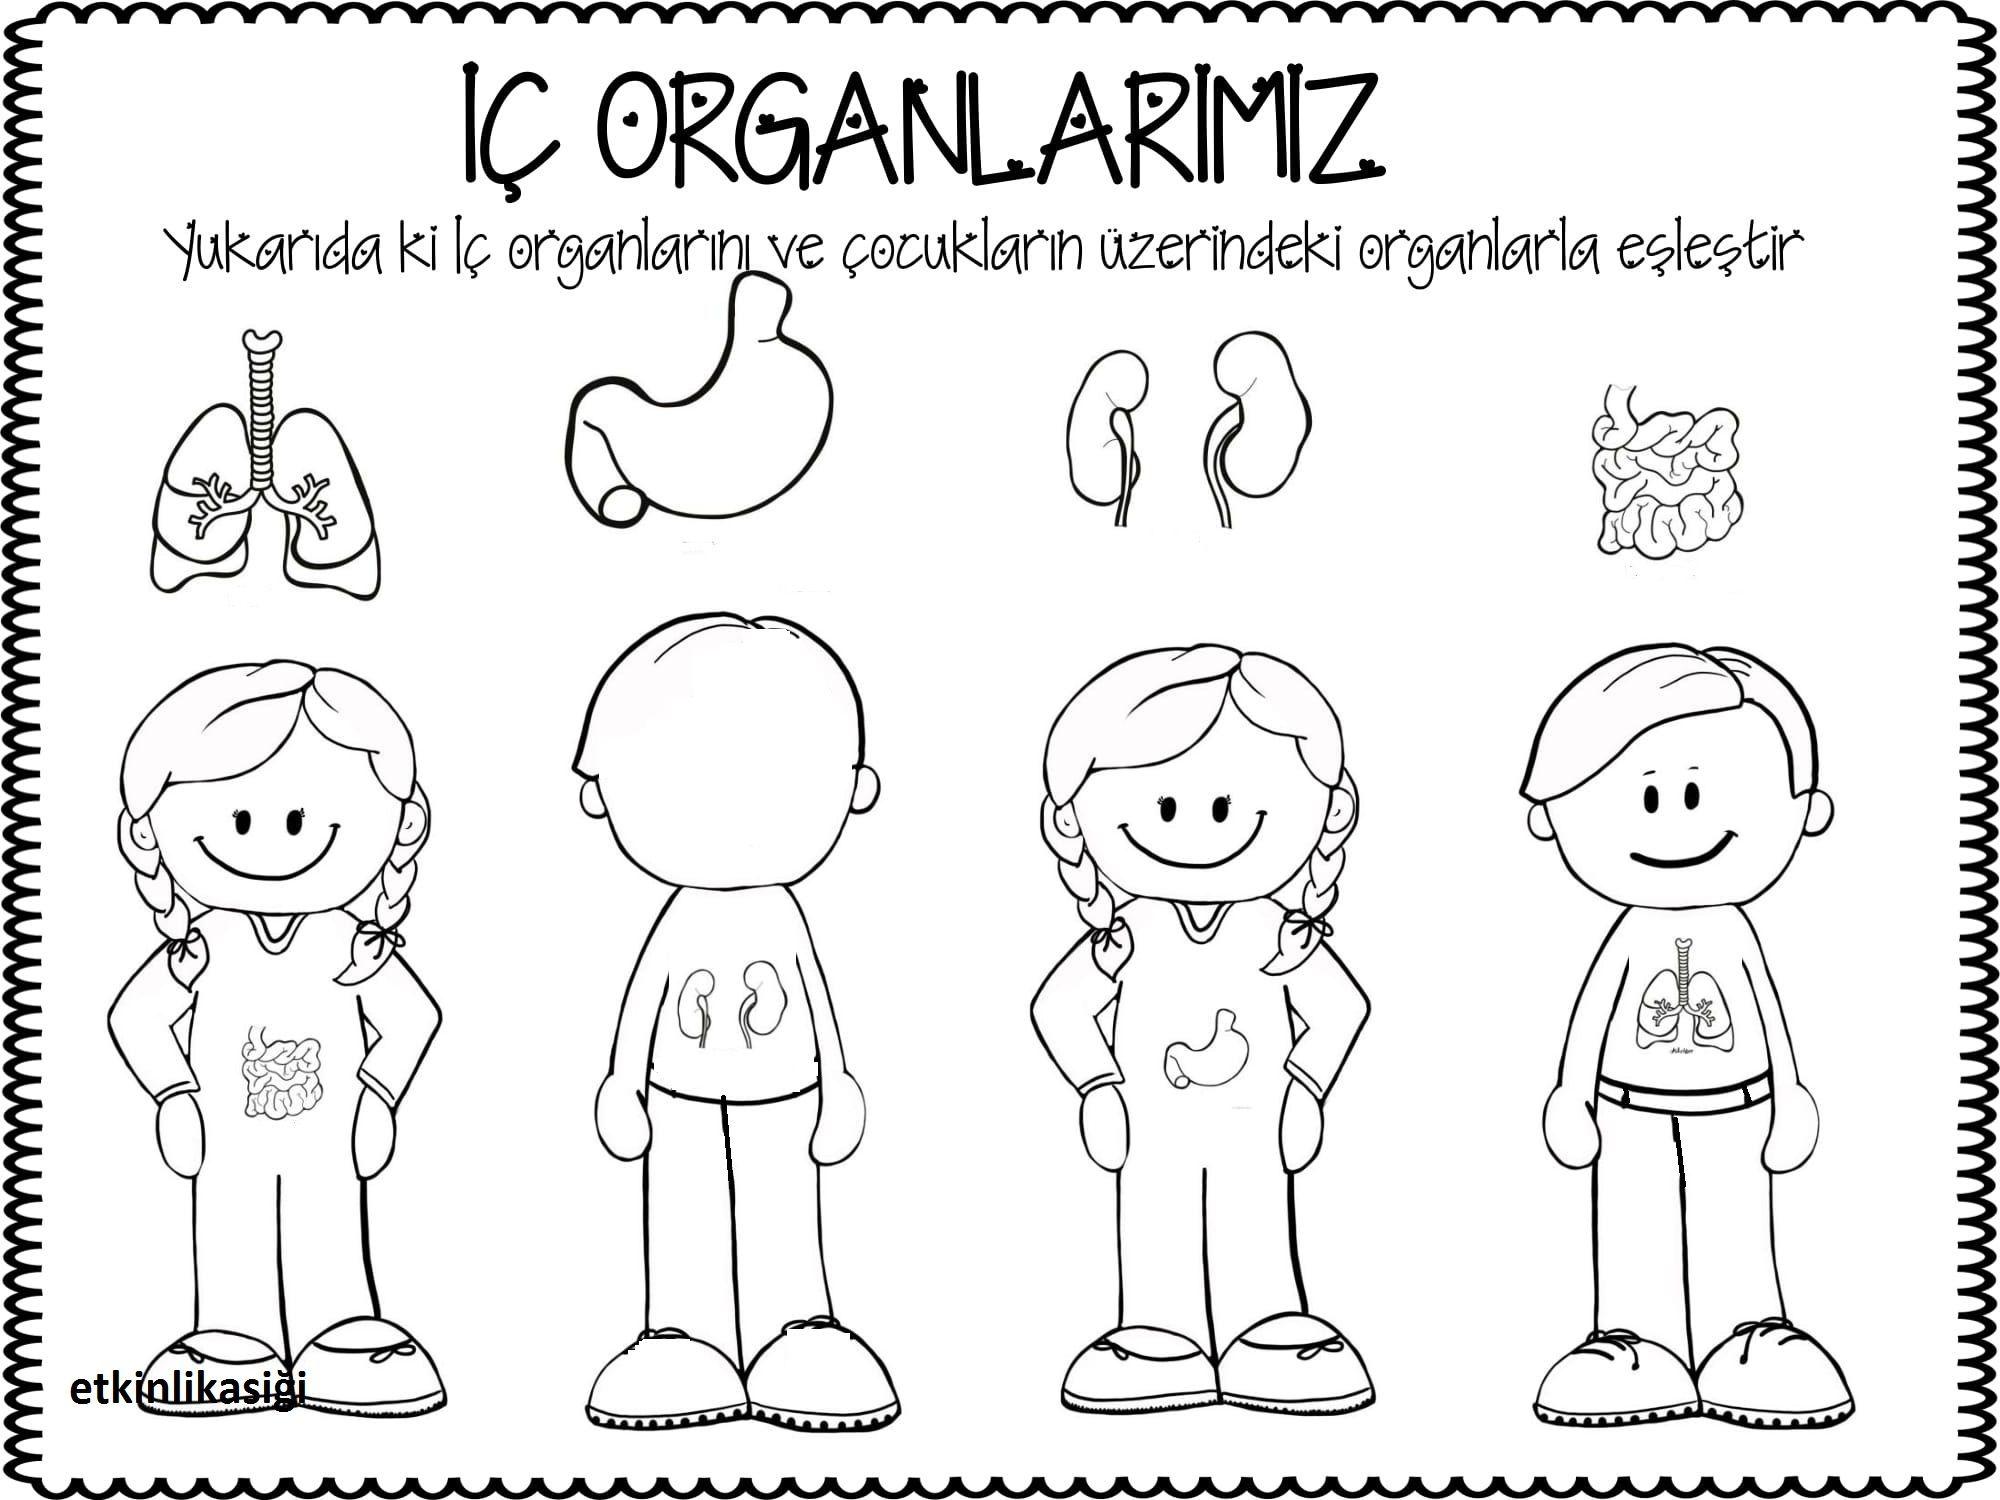 Iç Organlarim Sare Preescolar Educacion Ve Escuela